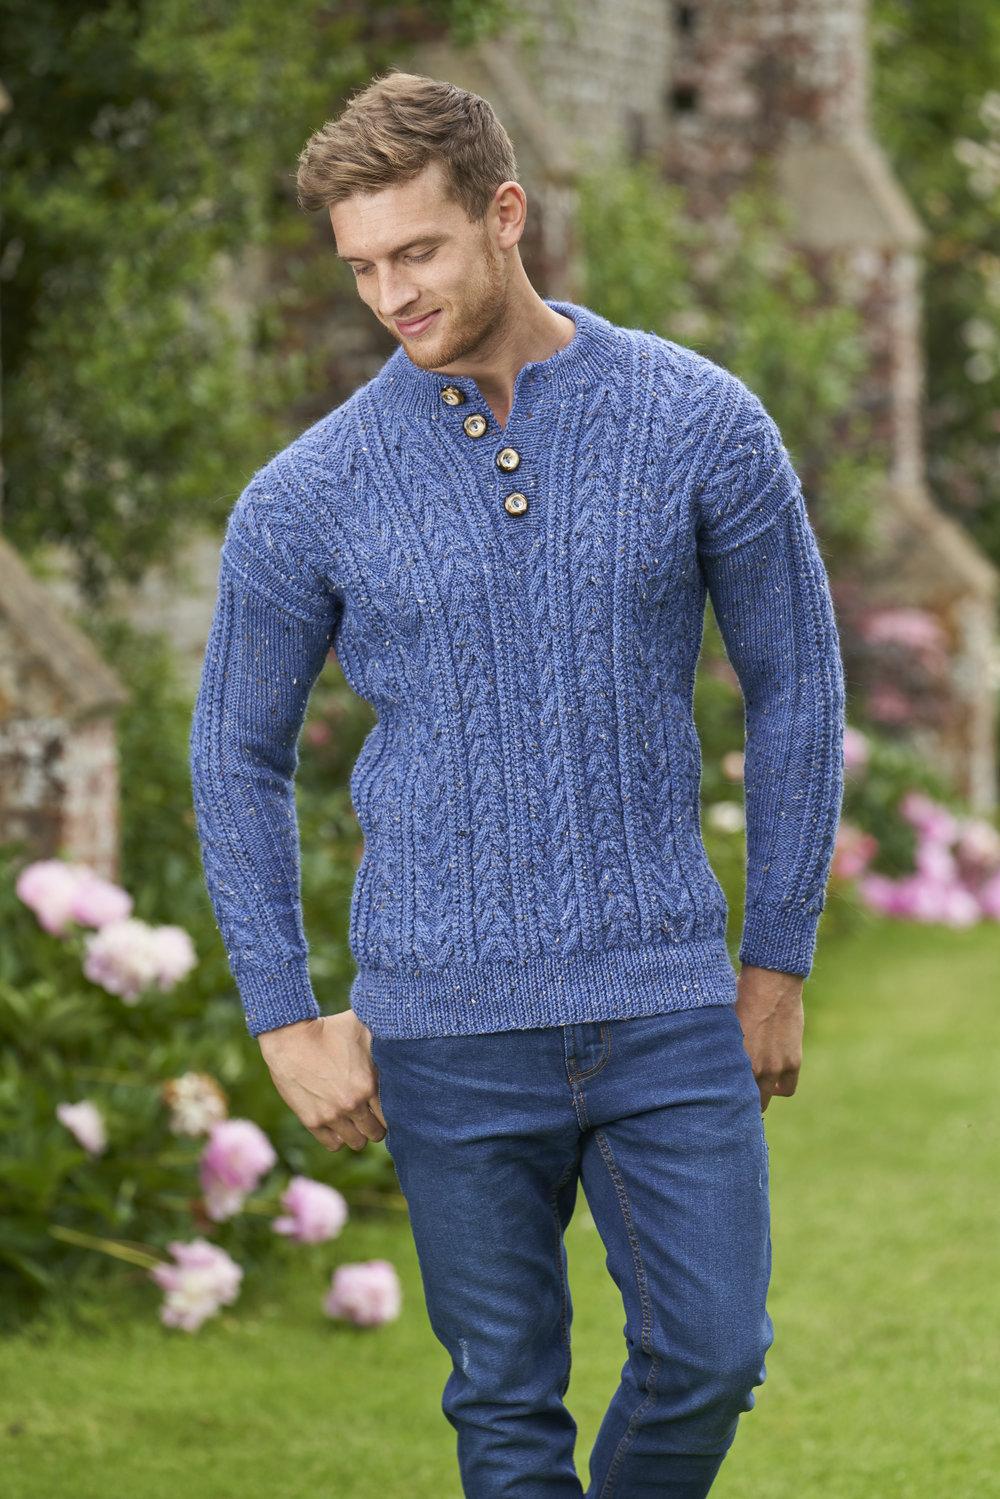 knitter070618jw_1070.jpg